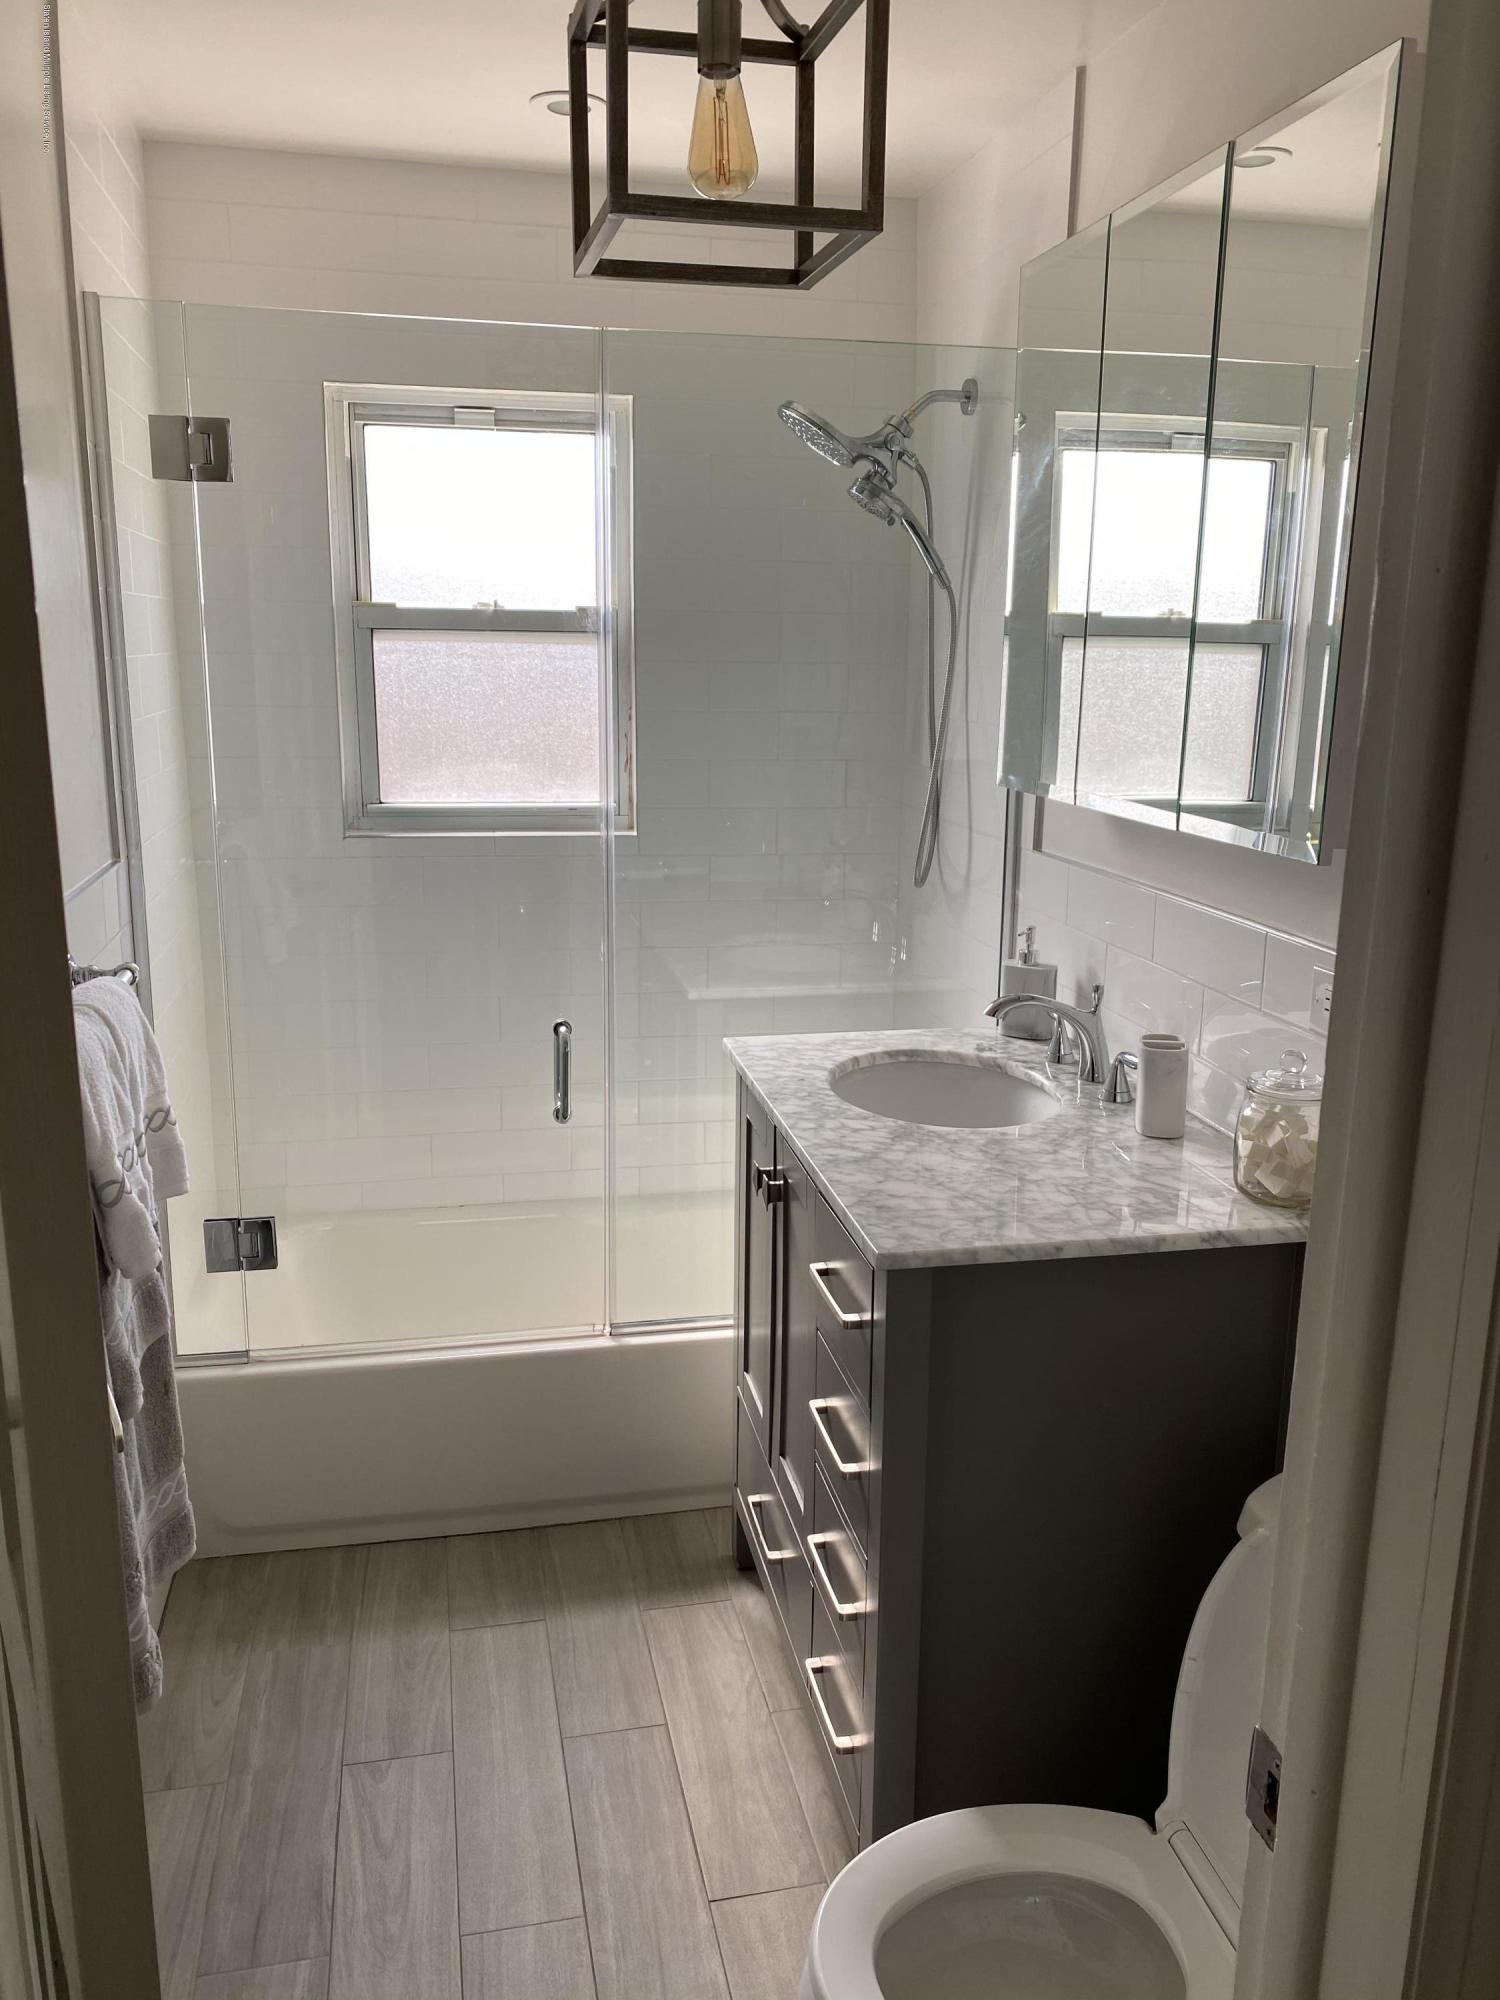 Single Family - Semi-Attached 370 Seaver Avenue  Staten Island, NY 10305, MLS-1136339-10